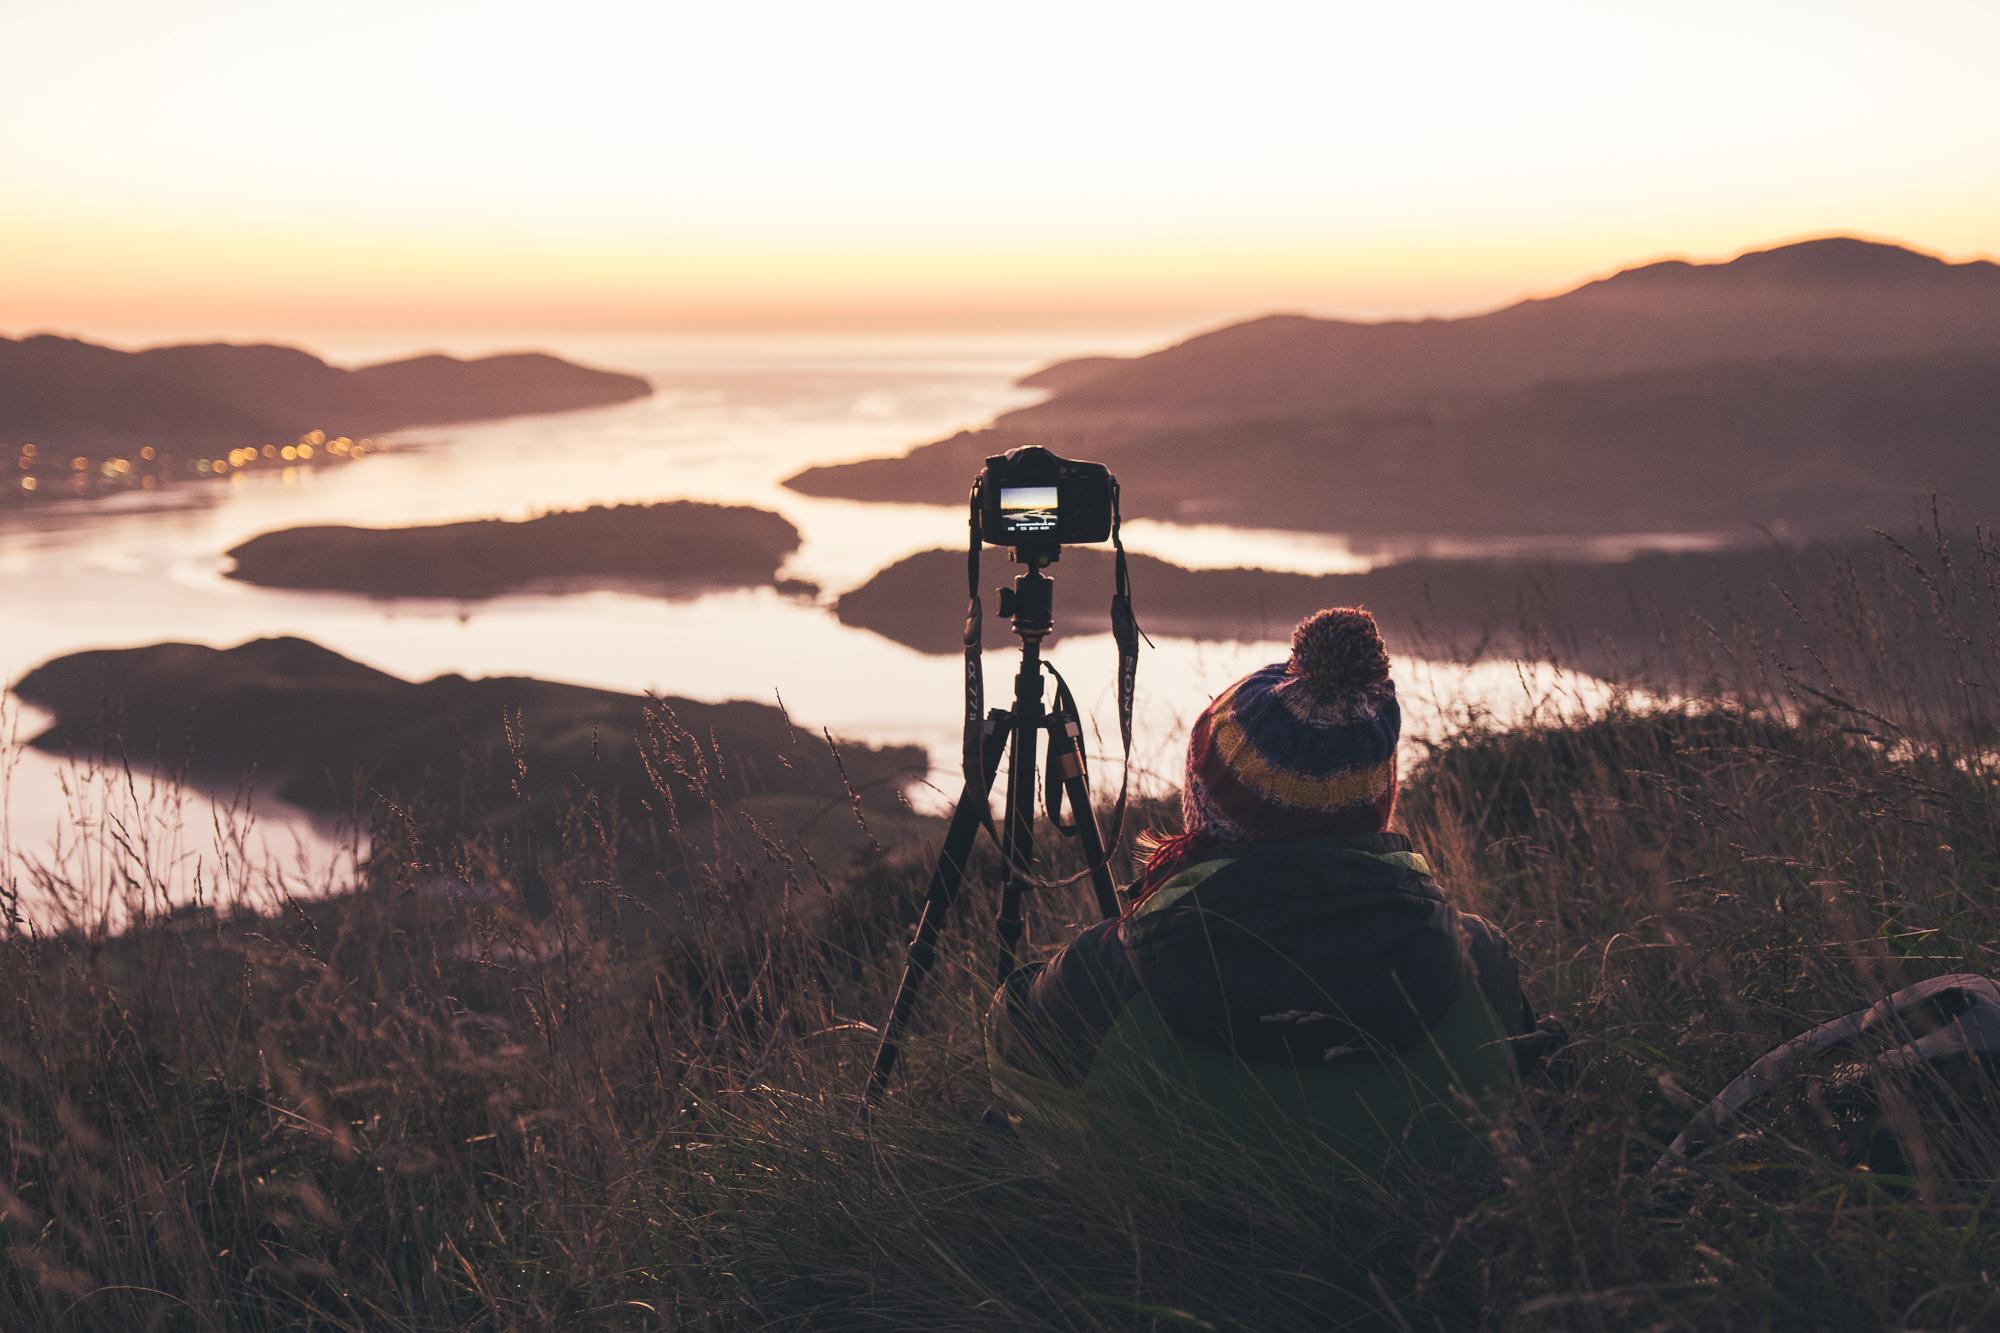 photography-workshops-crater-rim-03.jpg